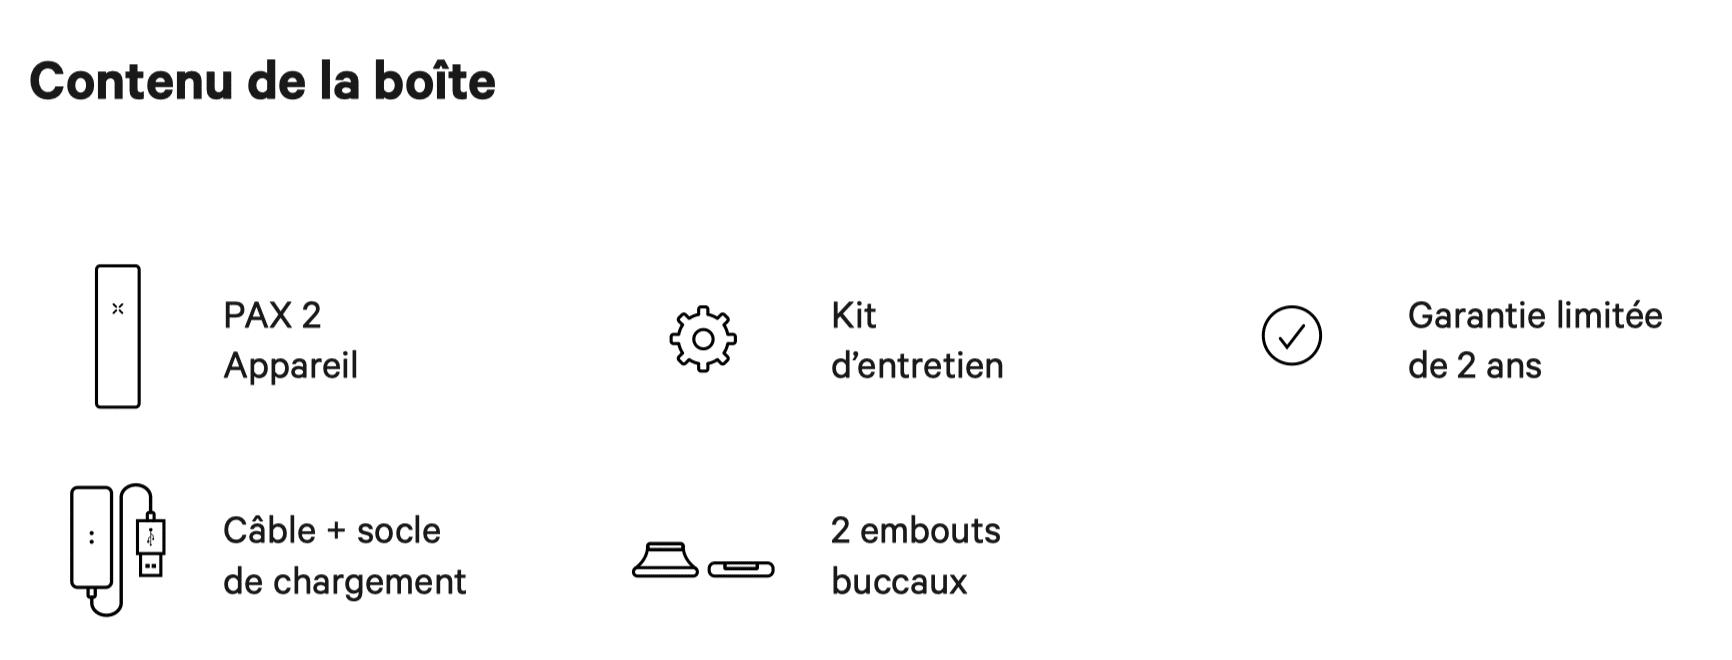 Inhalt der Pax 2 Vaporizer Box